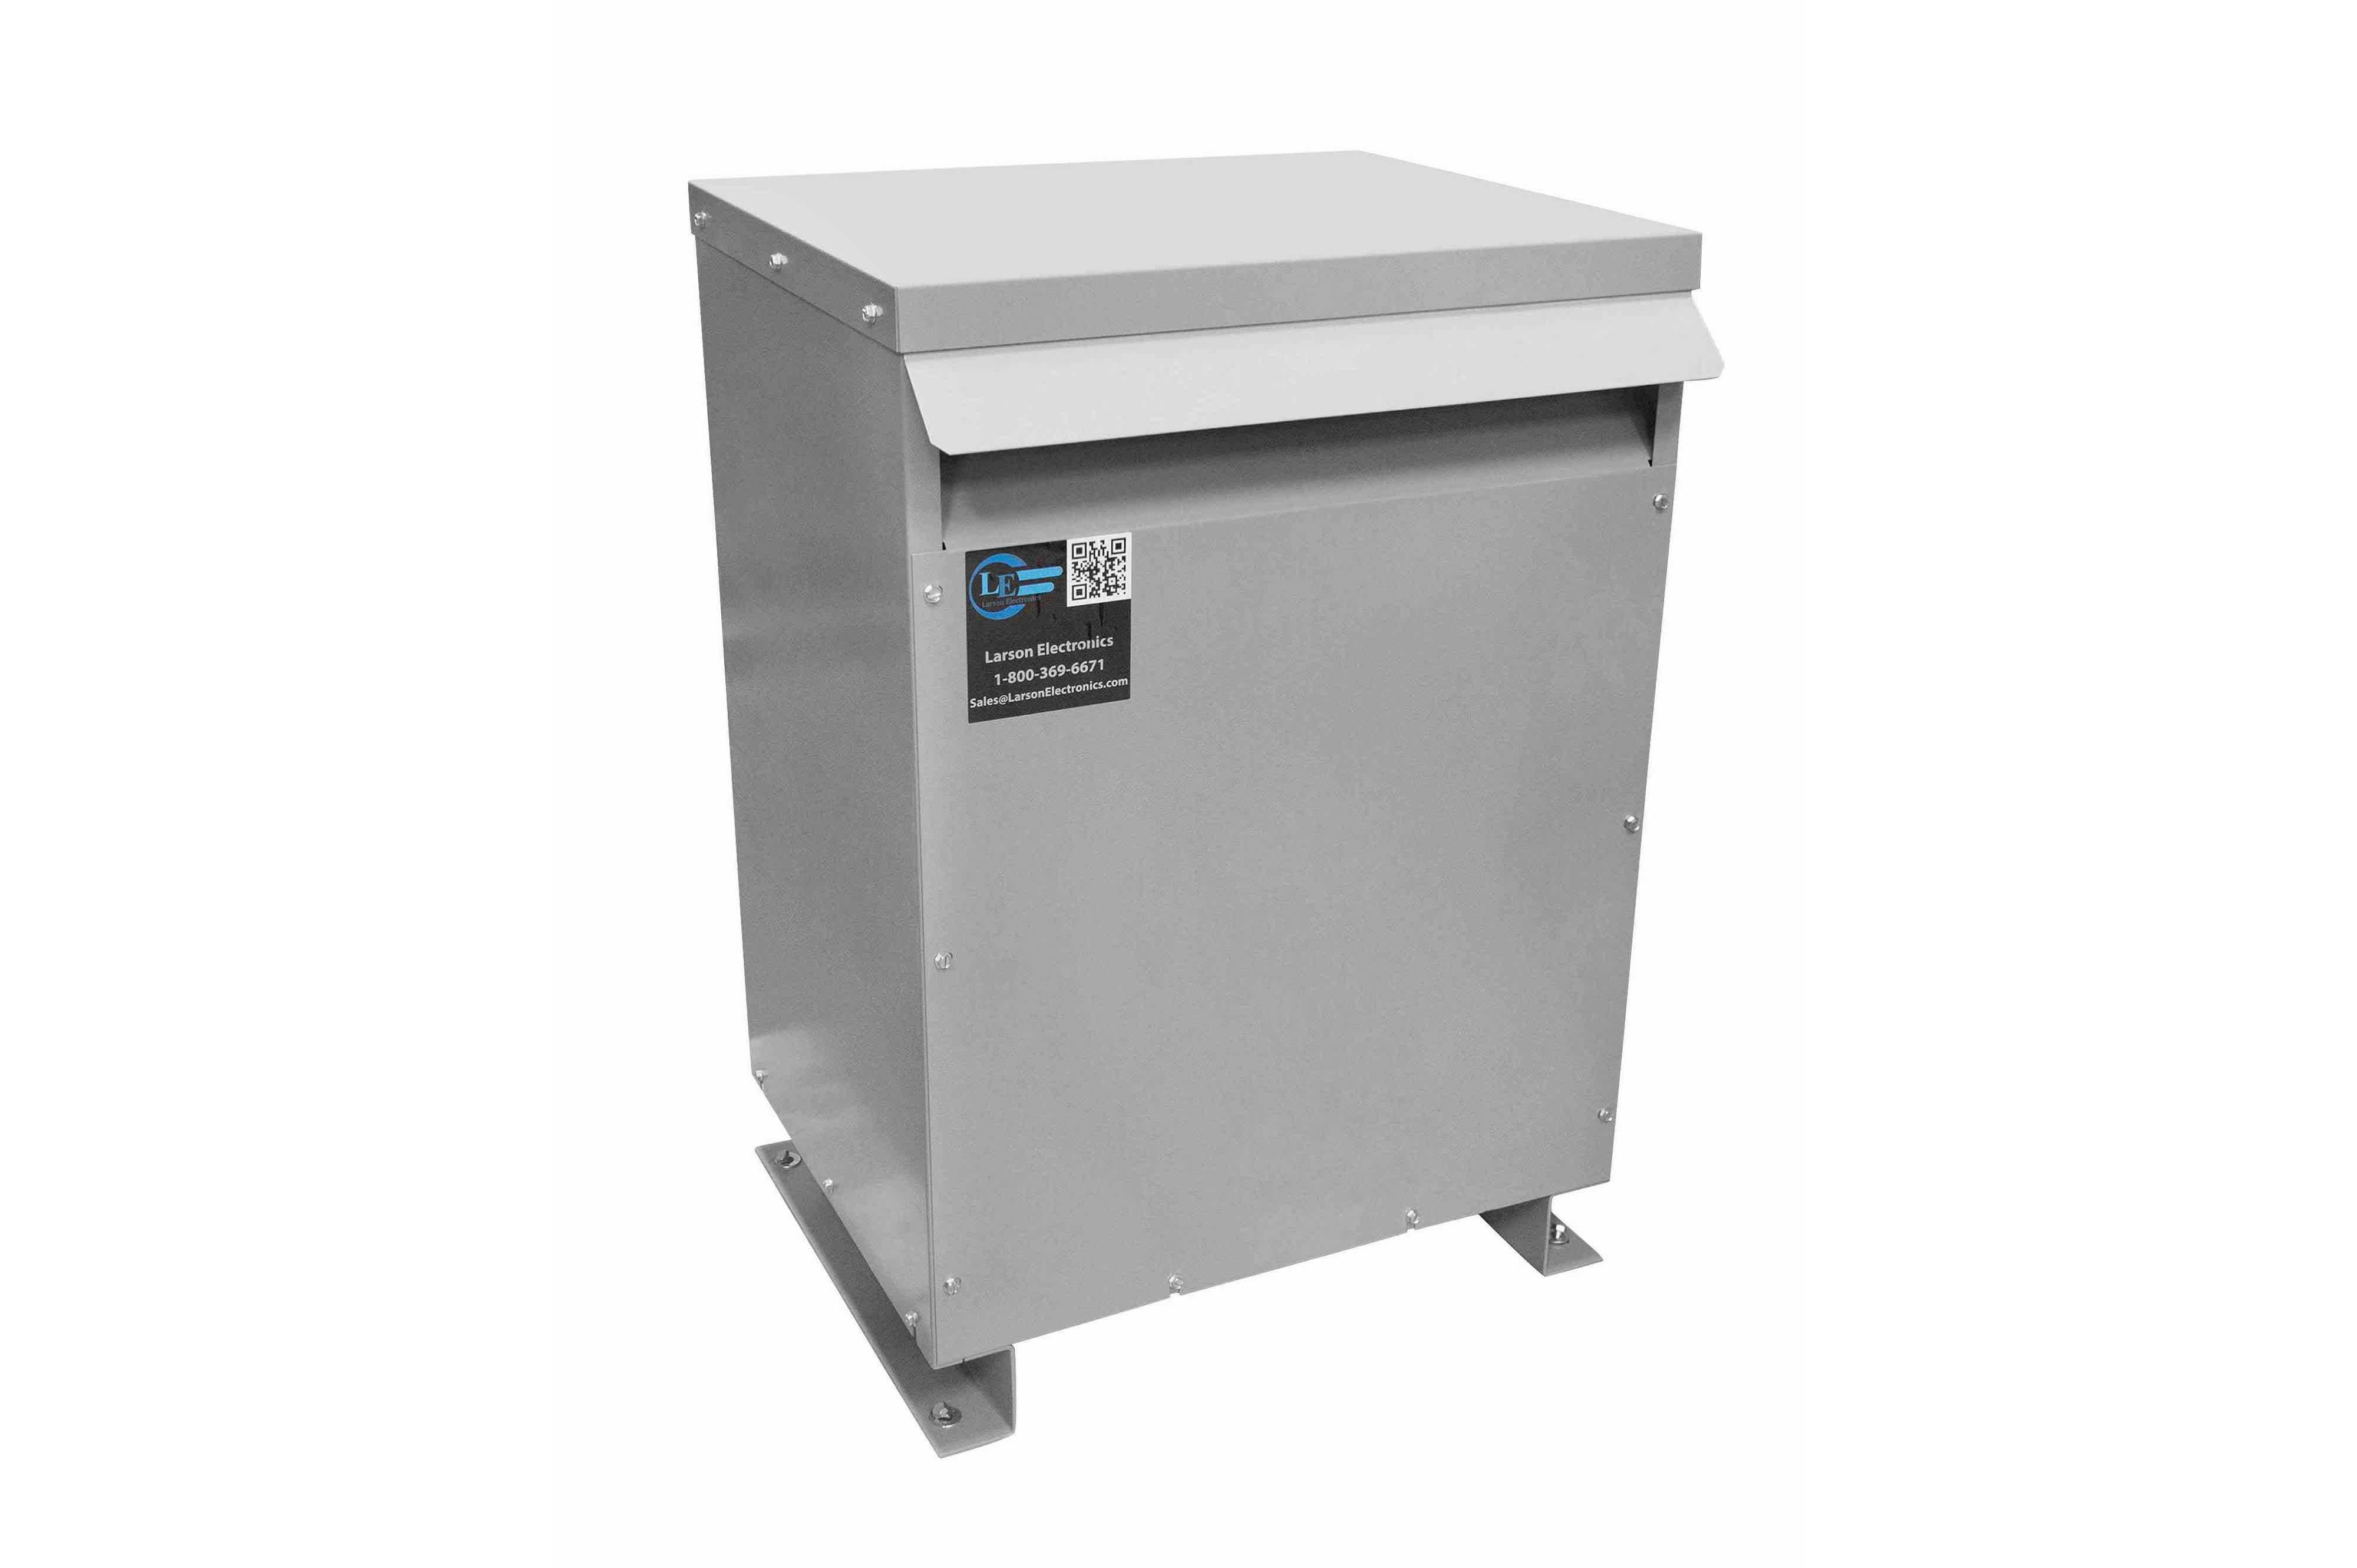 900 kVA 3PH Isolation Transformer, 440V Wye Primary, 208Y/120 Wye-N Secondary, N3R, Ventilated, 60 Hz